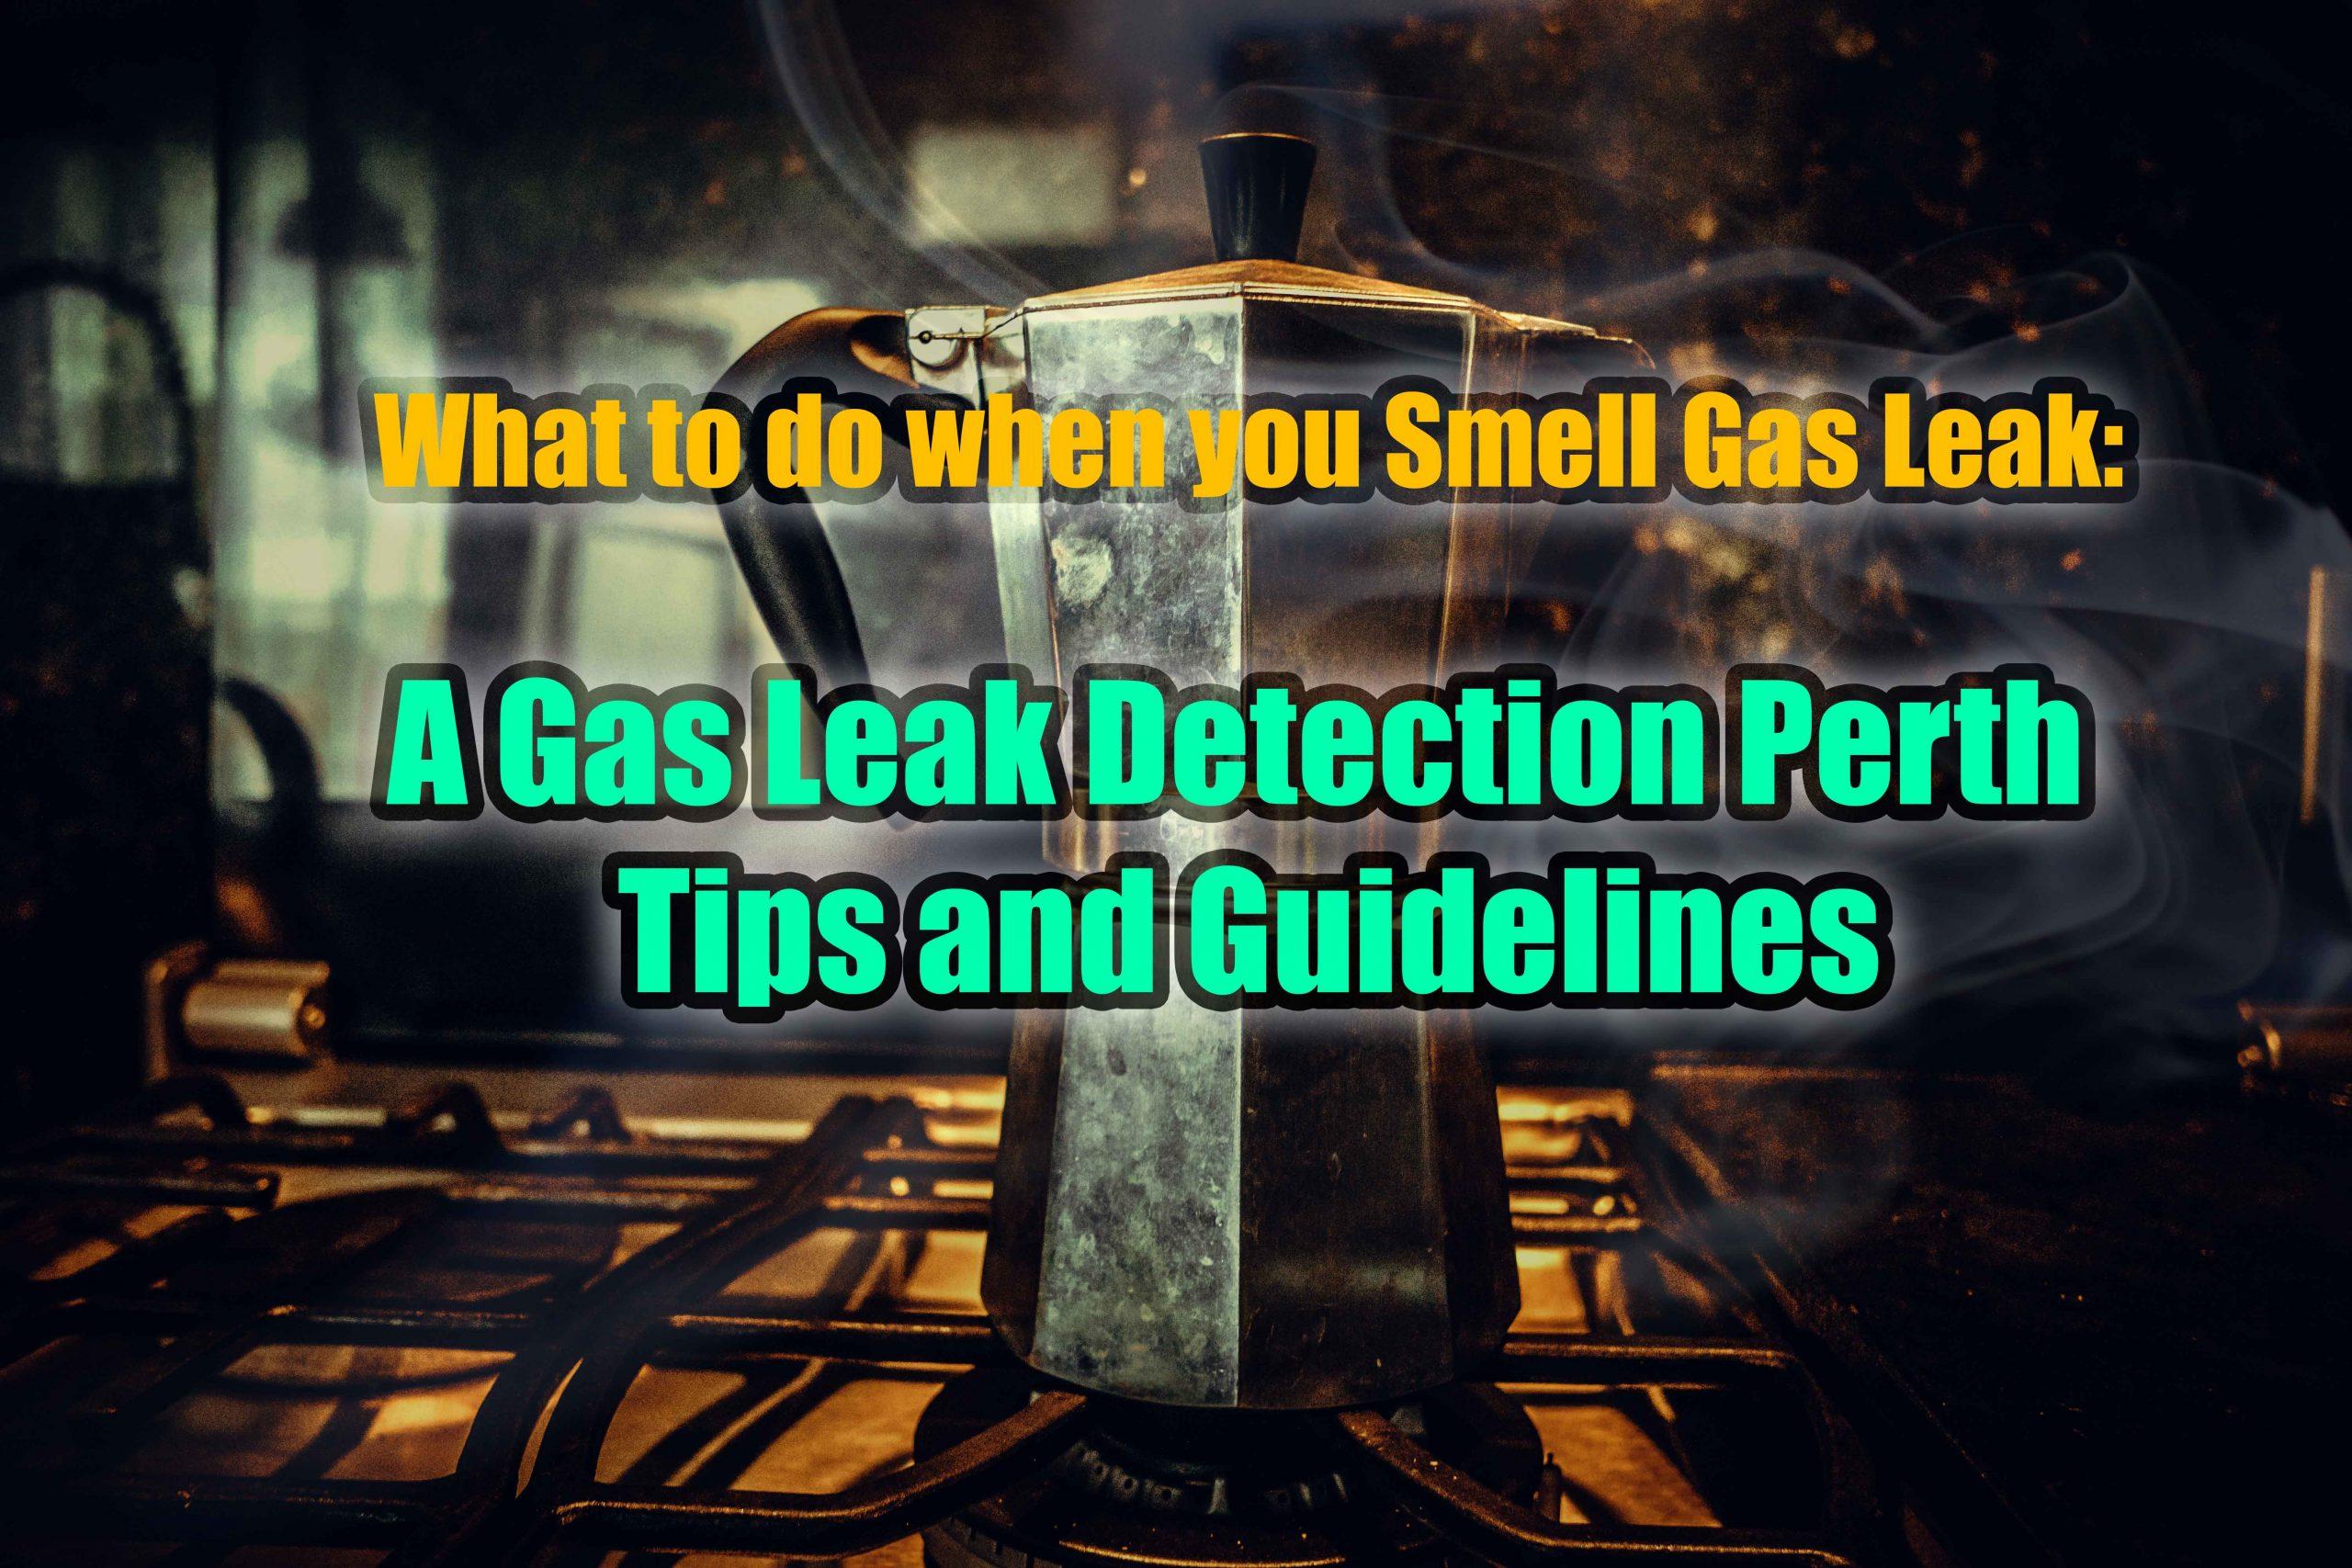 Gas Leak Detection Perth